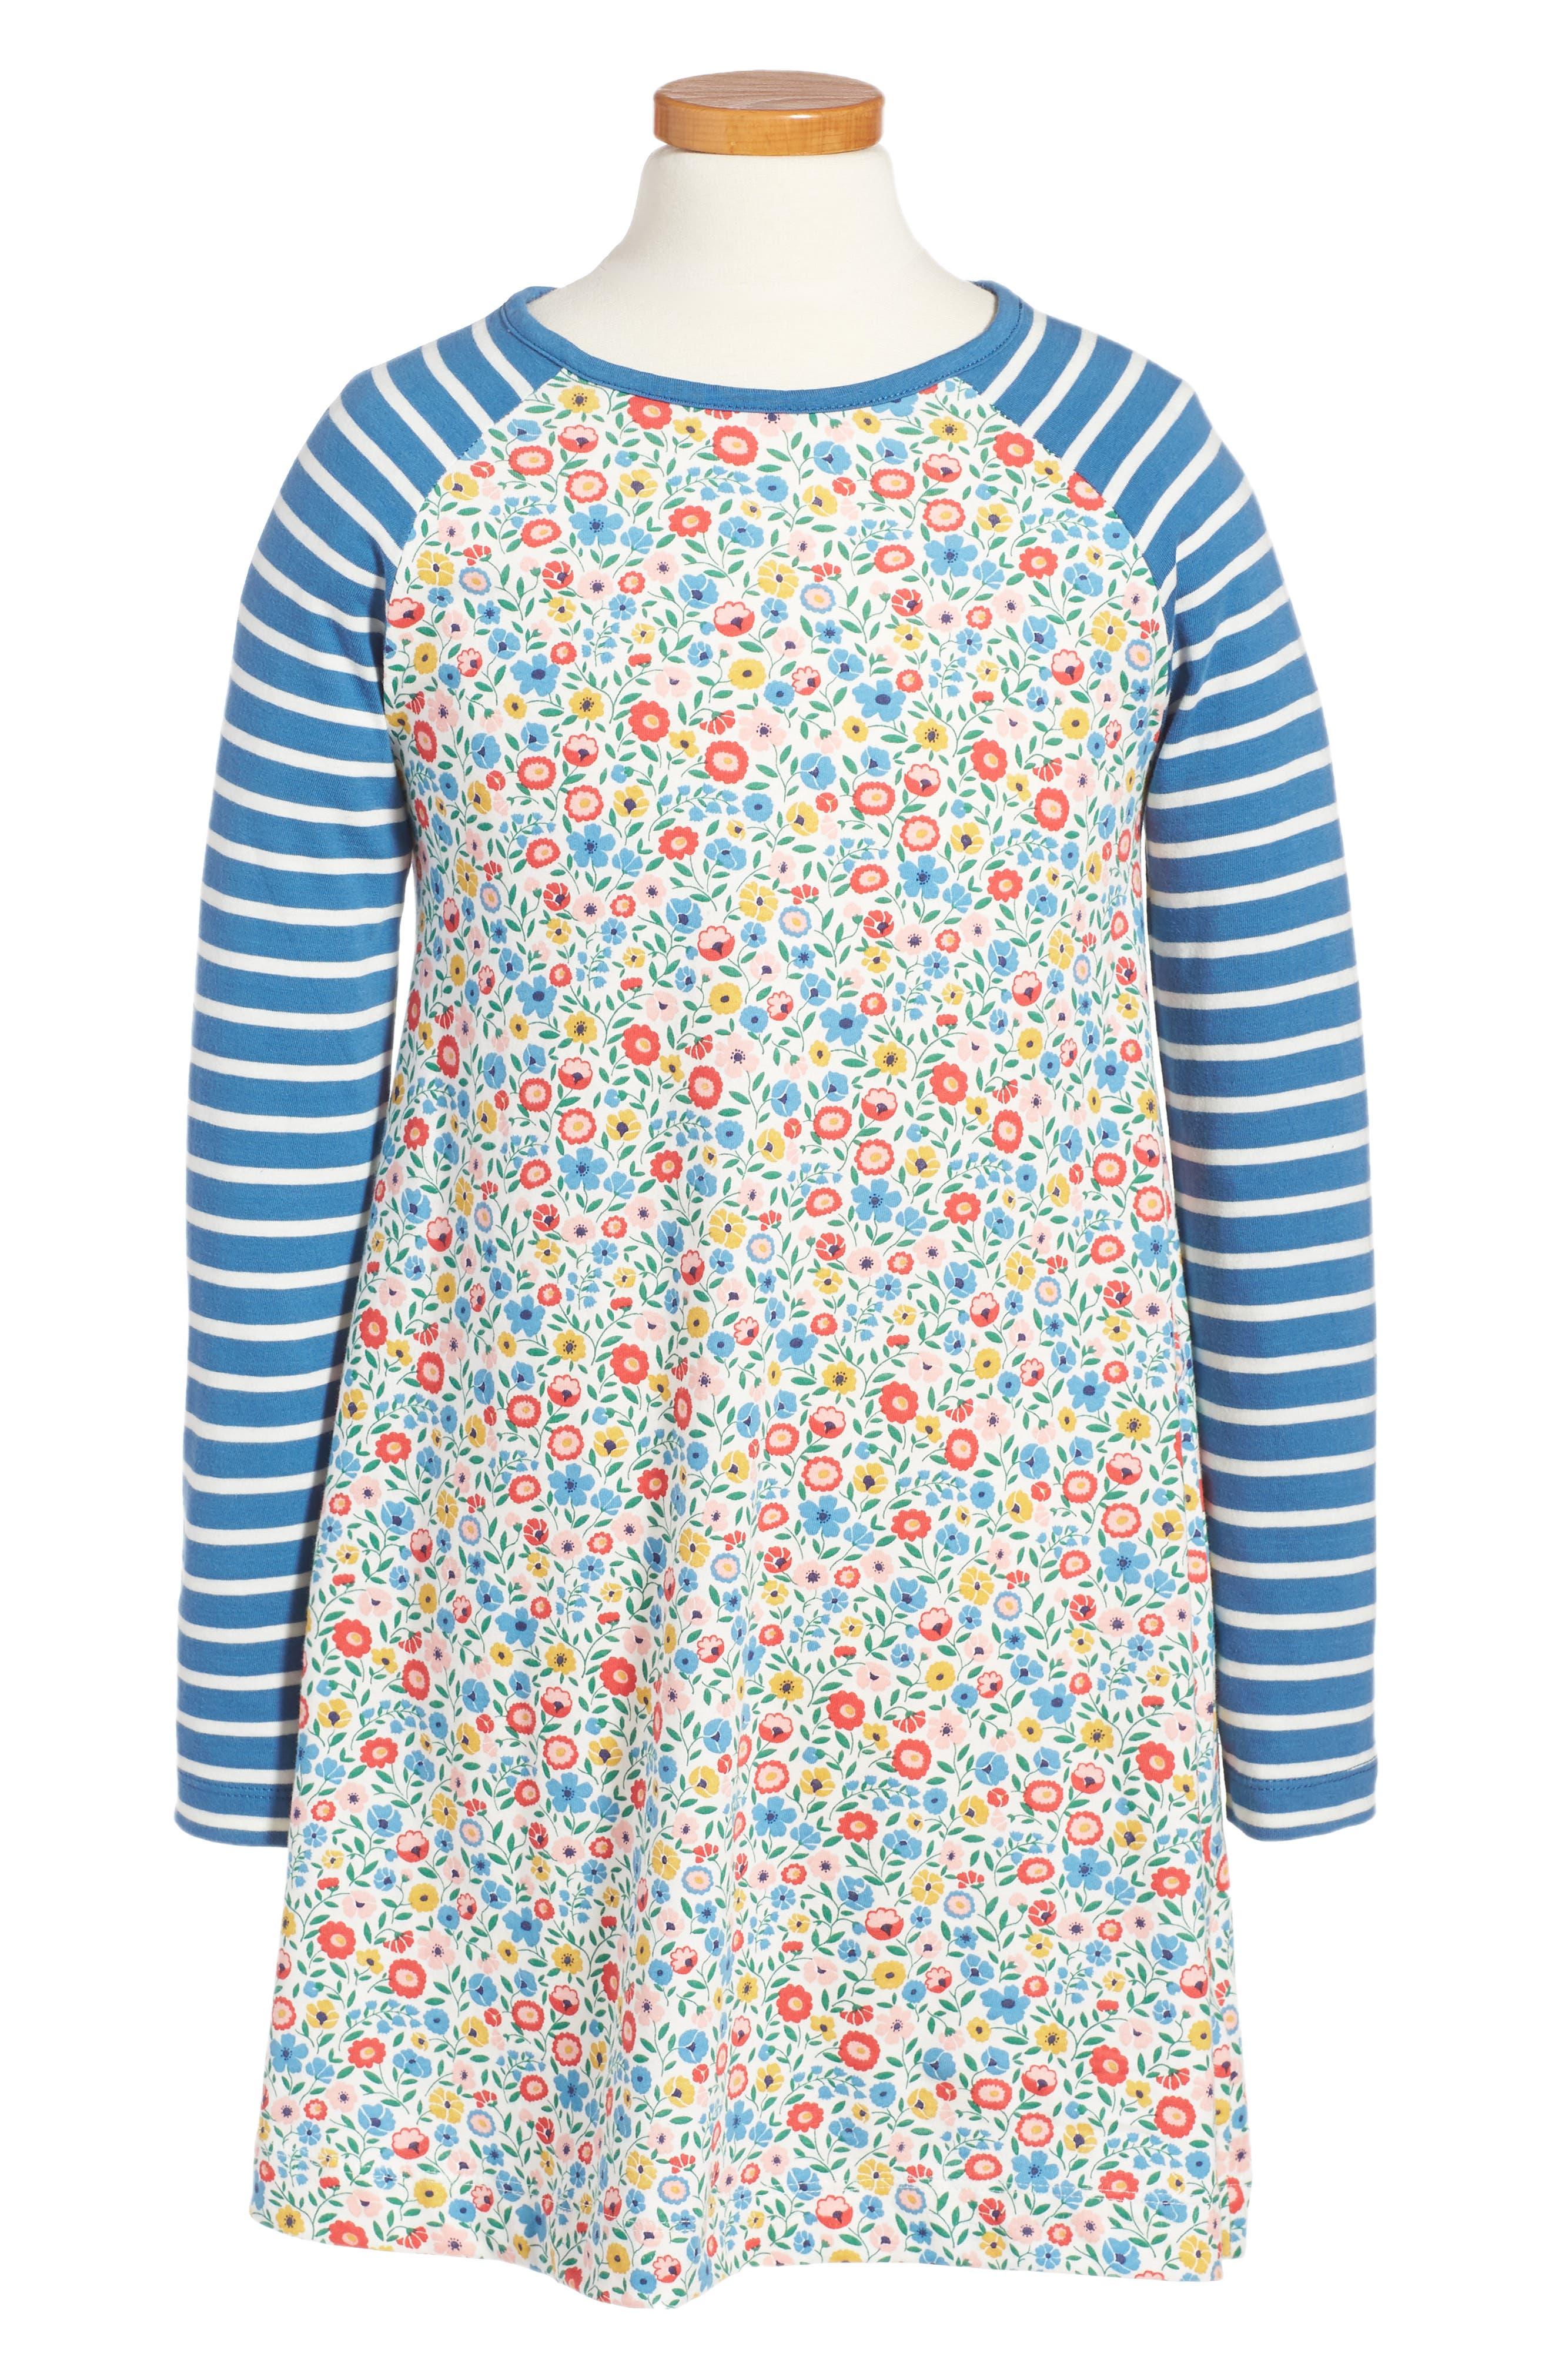 Jersey Swing Dress,                             Main thumbnail 1, color,                             902